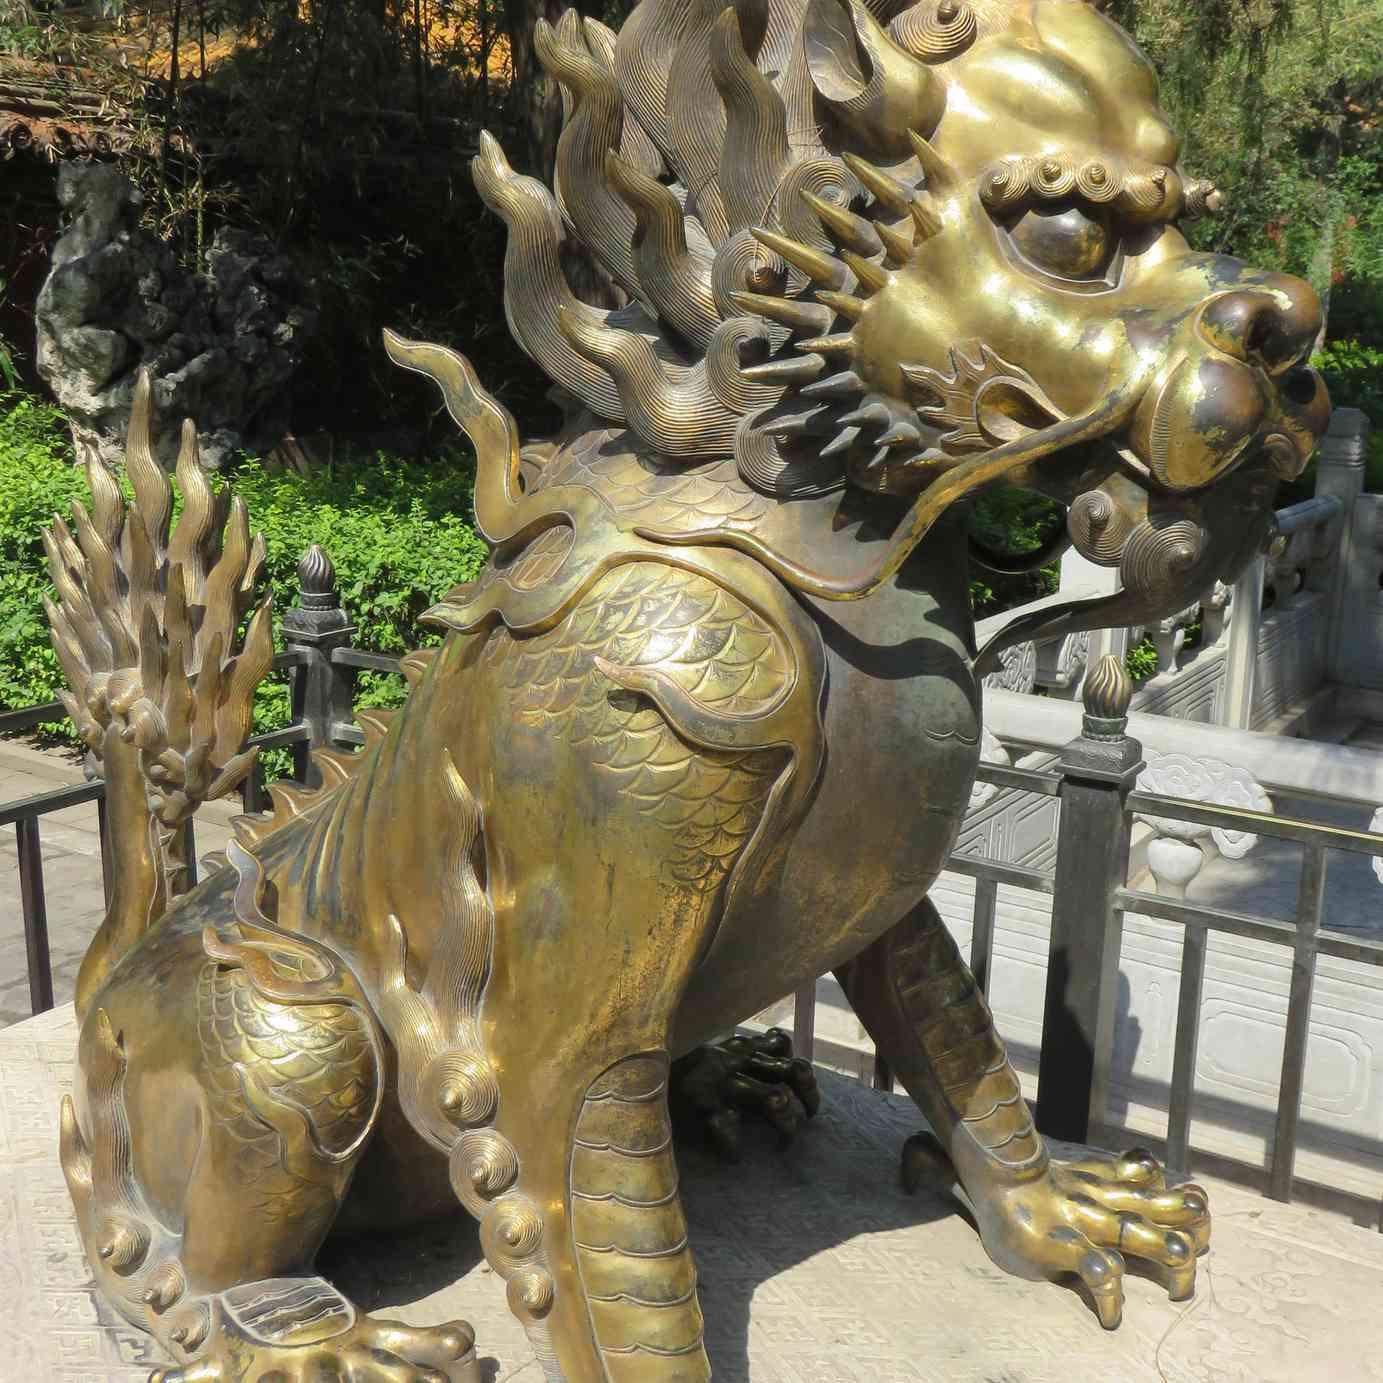 Imperial Garden Qilin Statue (Beijing, China)